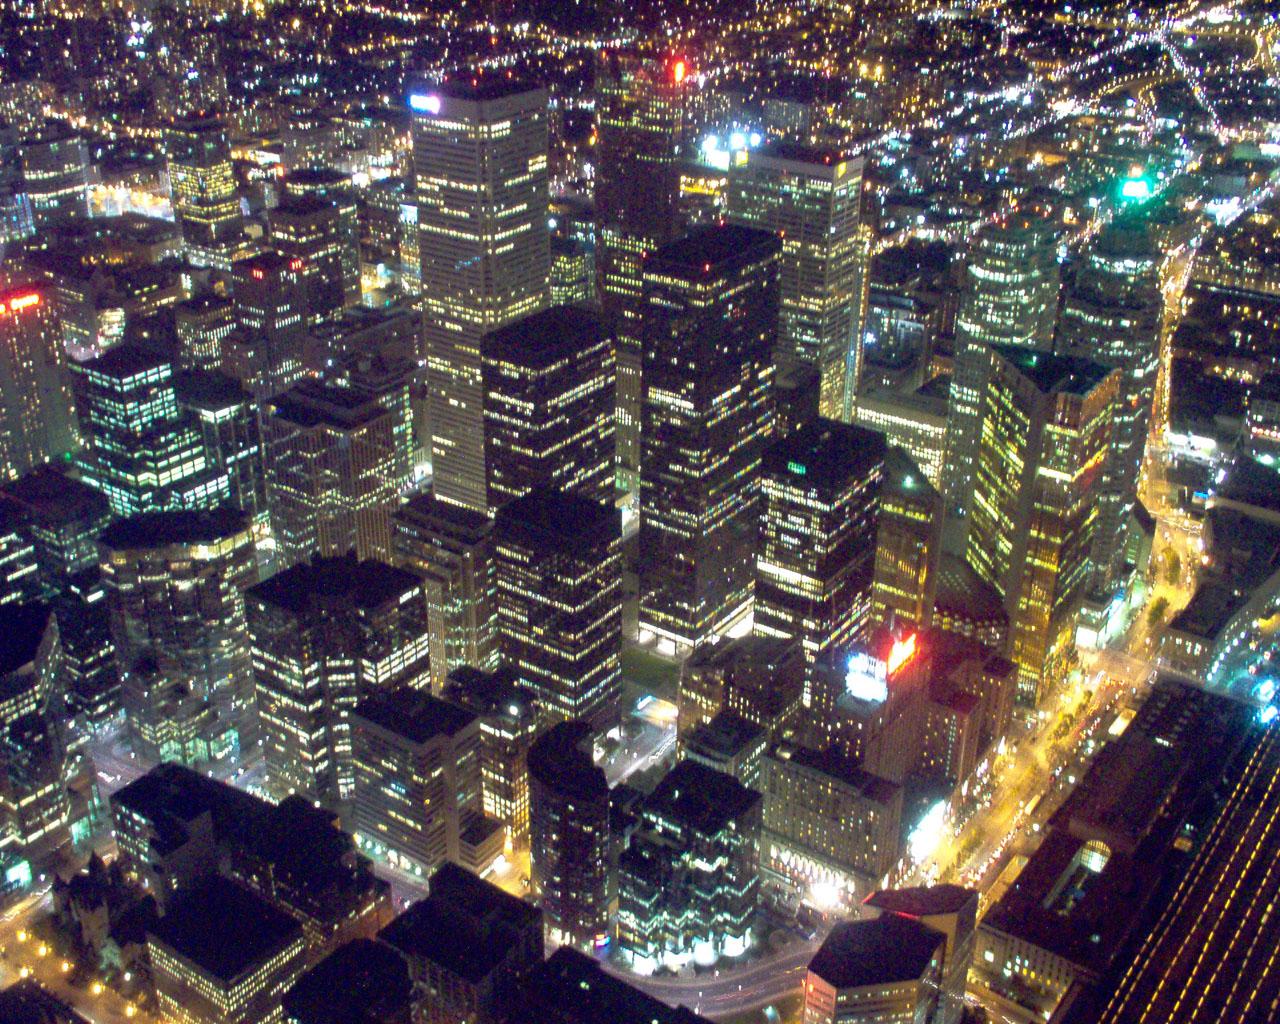 Description toronto downtown core at night